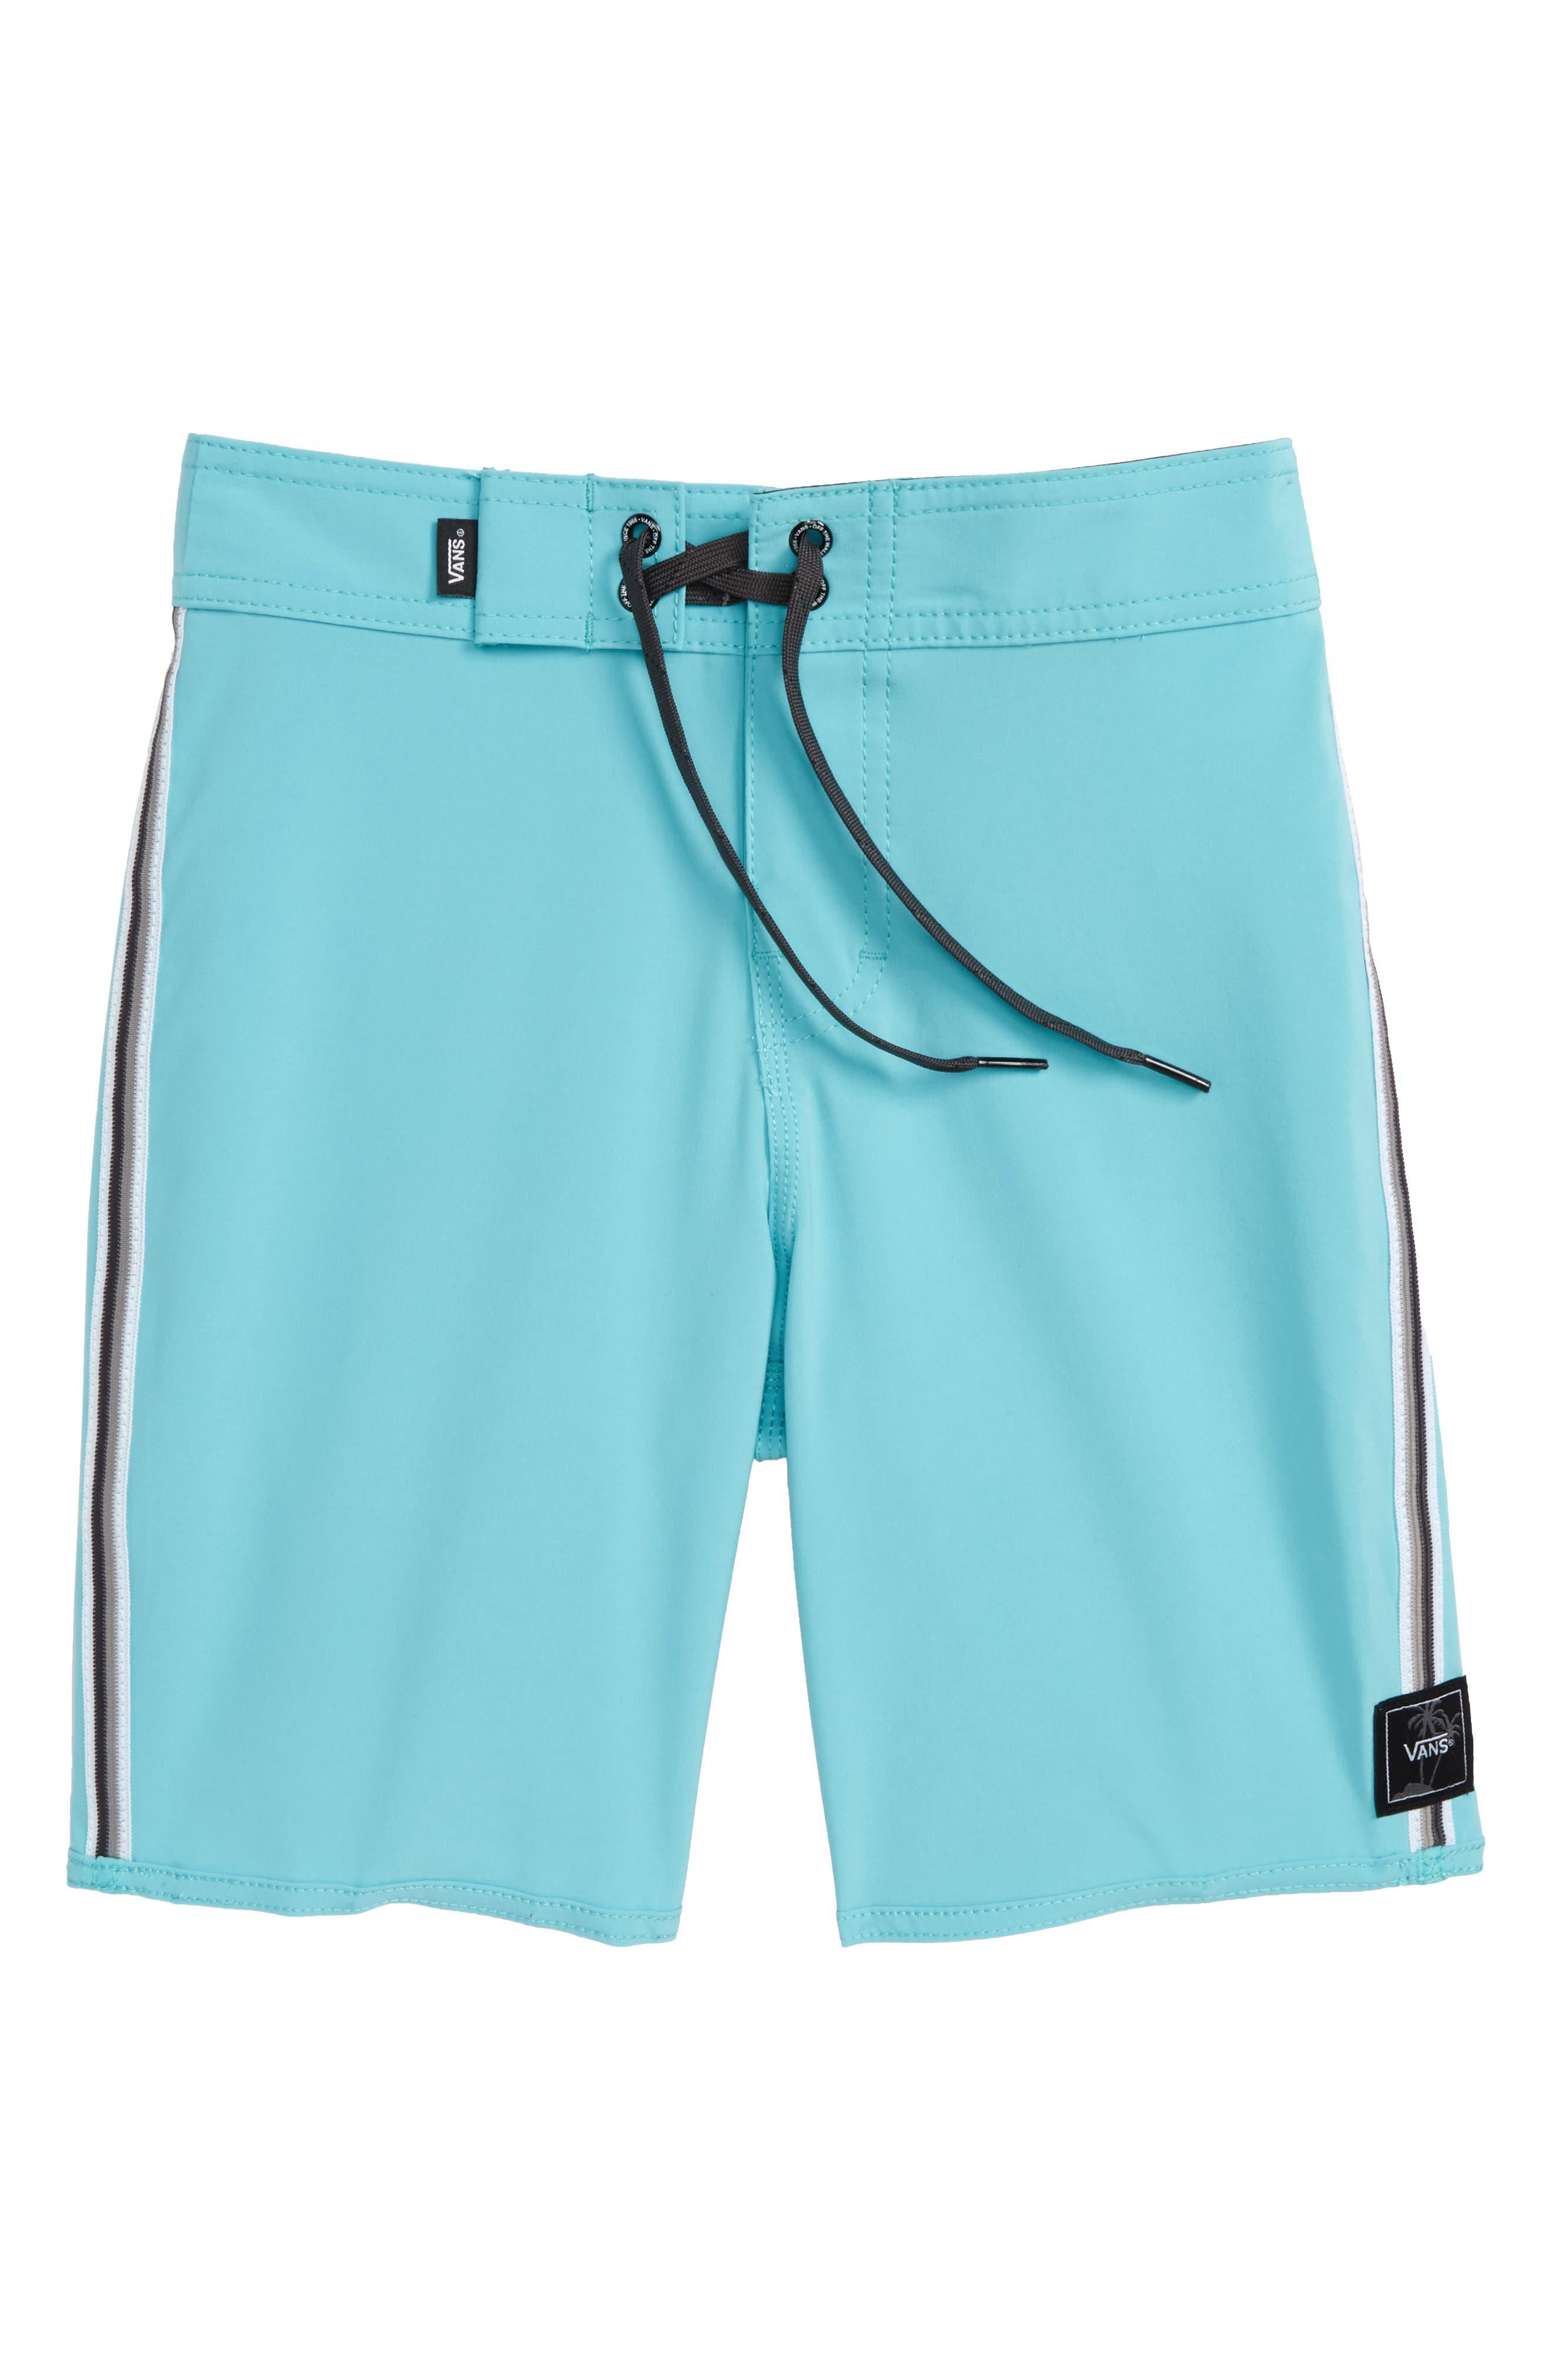 Sidestripe Board Shorts,                         Main,                         color,